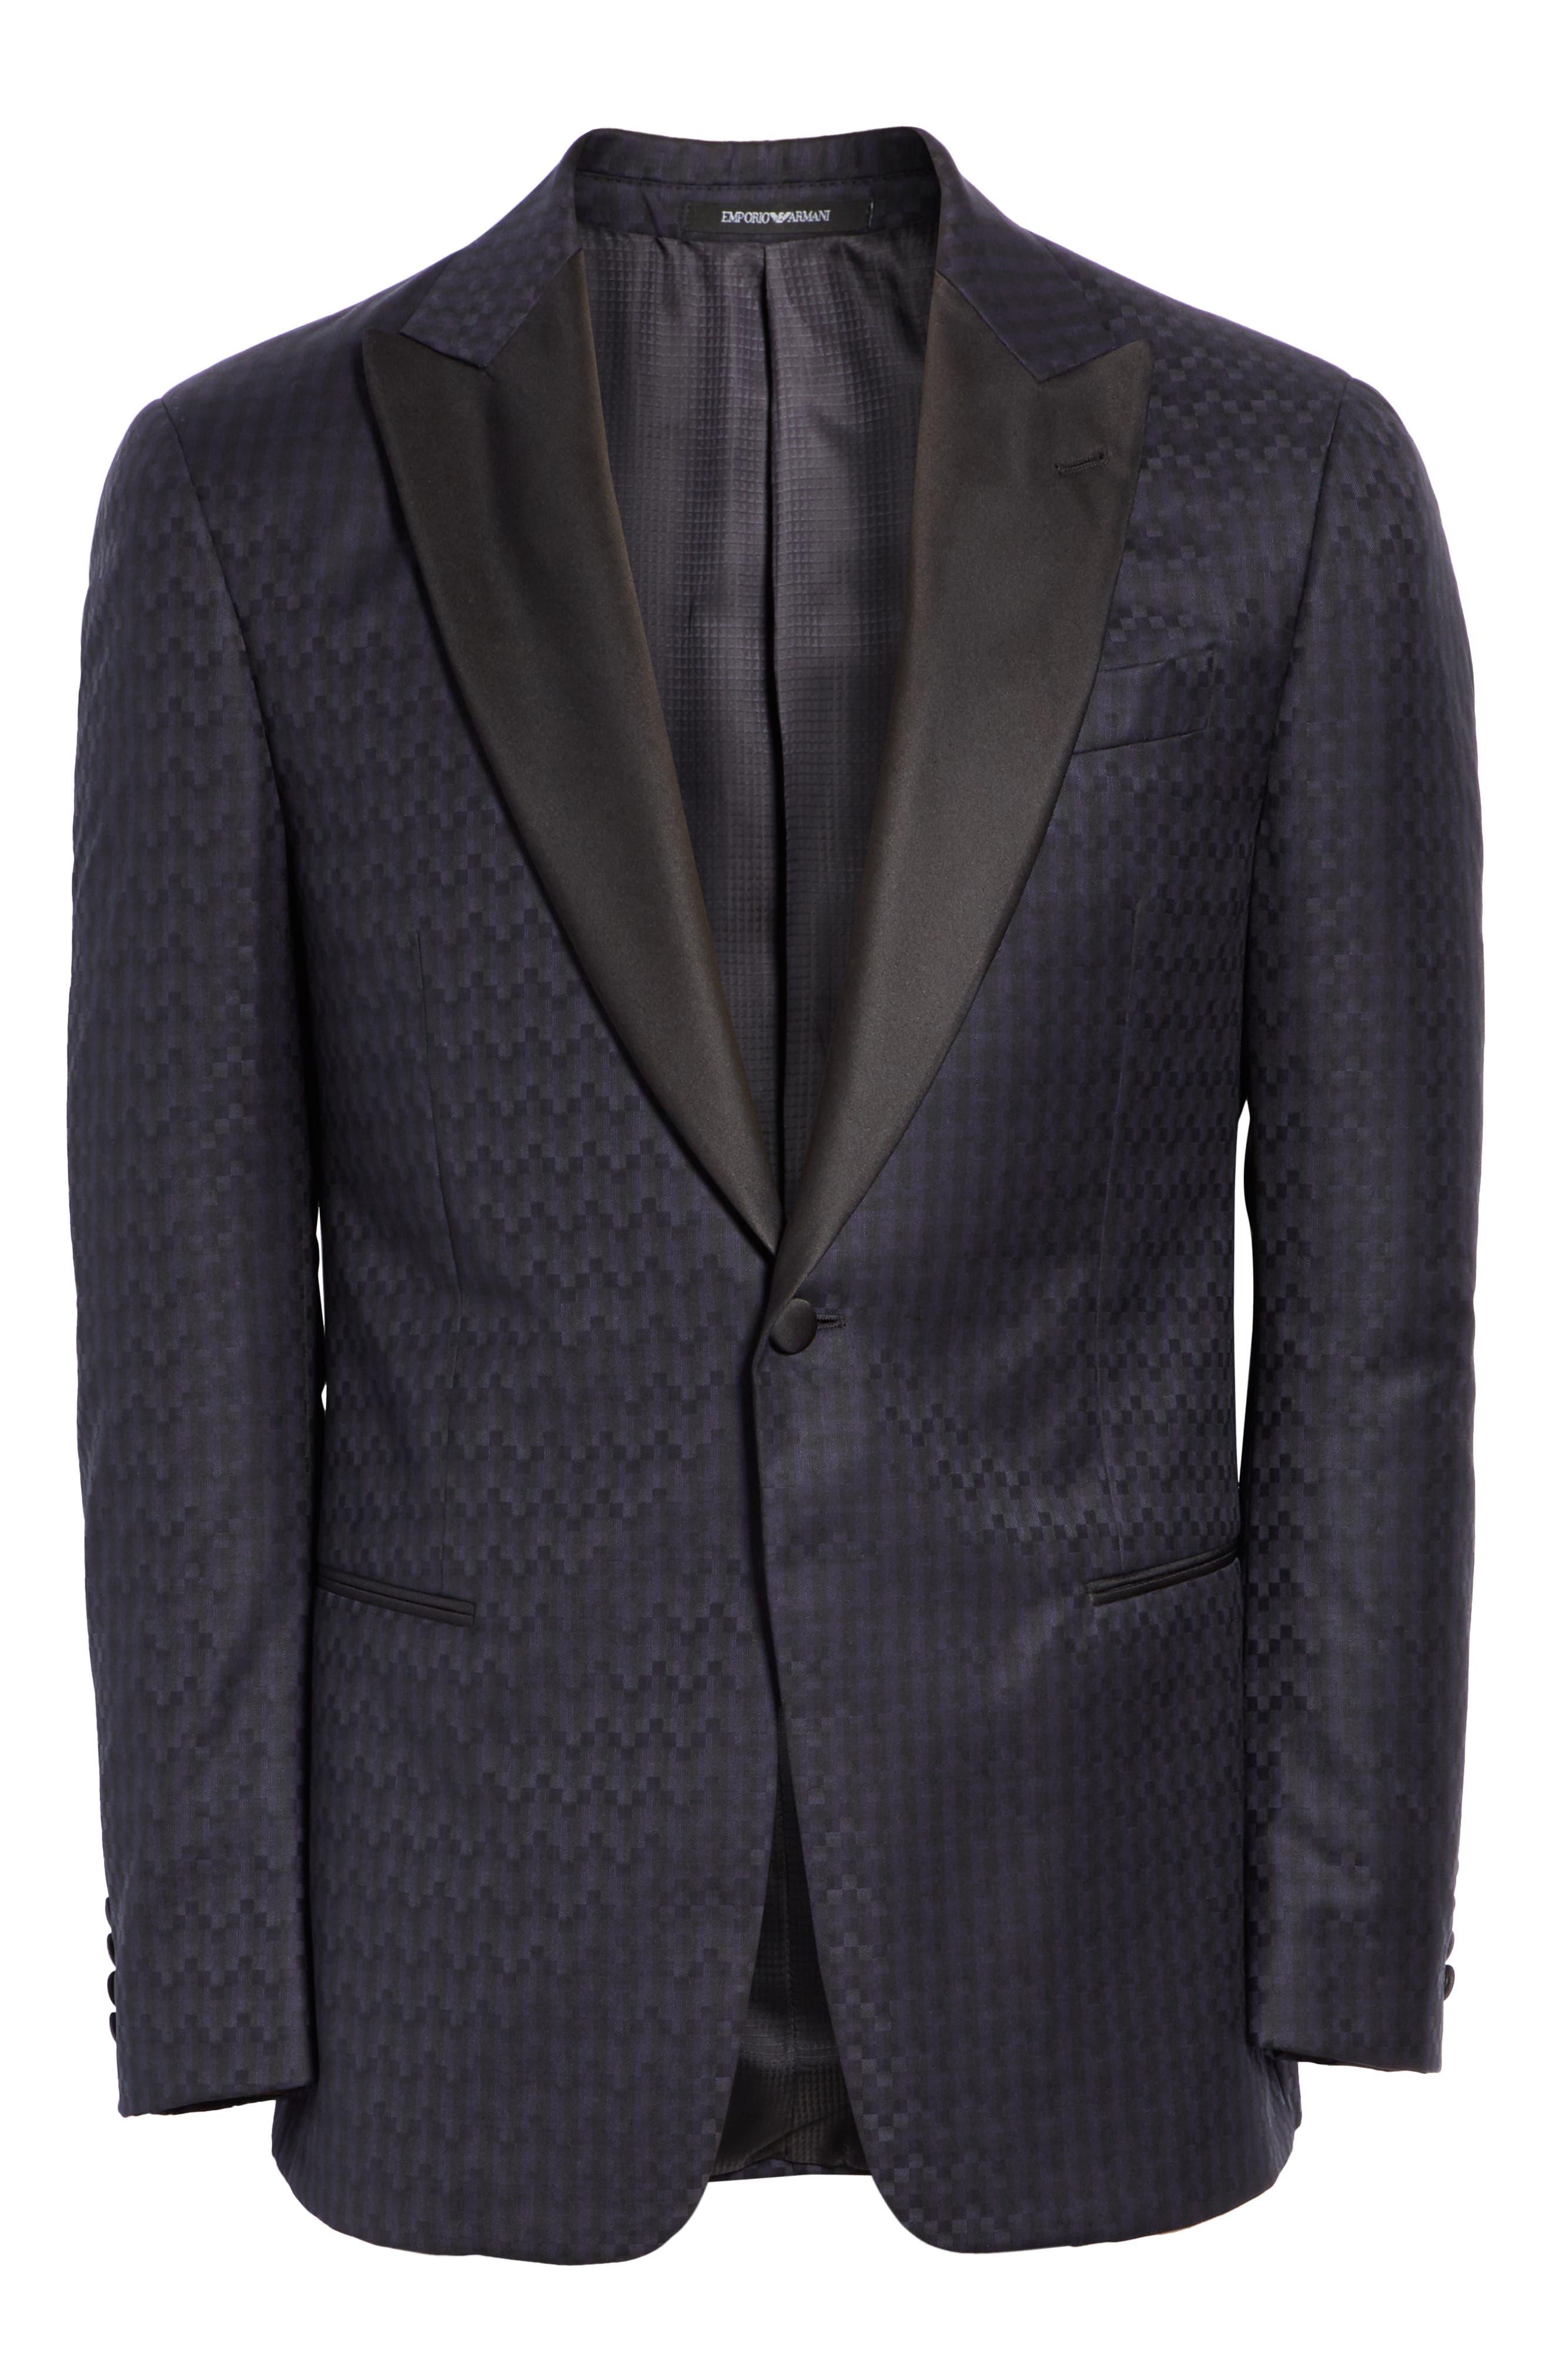 G-Line Trim Fit Wool Dinner Jacket,                             Alternate thumbnail 5, color,                             MIDNIGHT